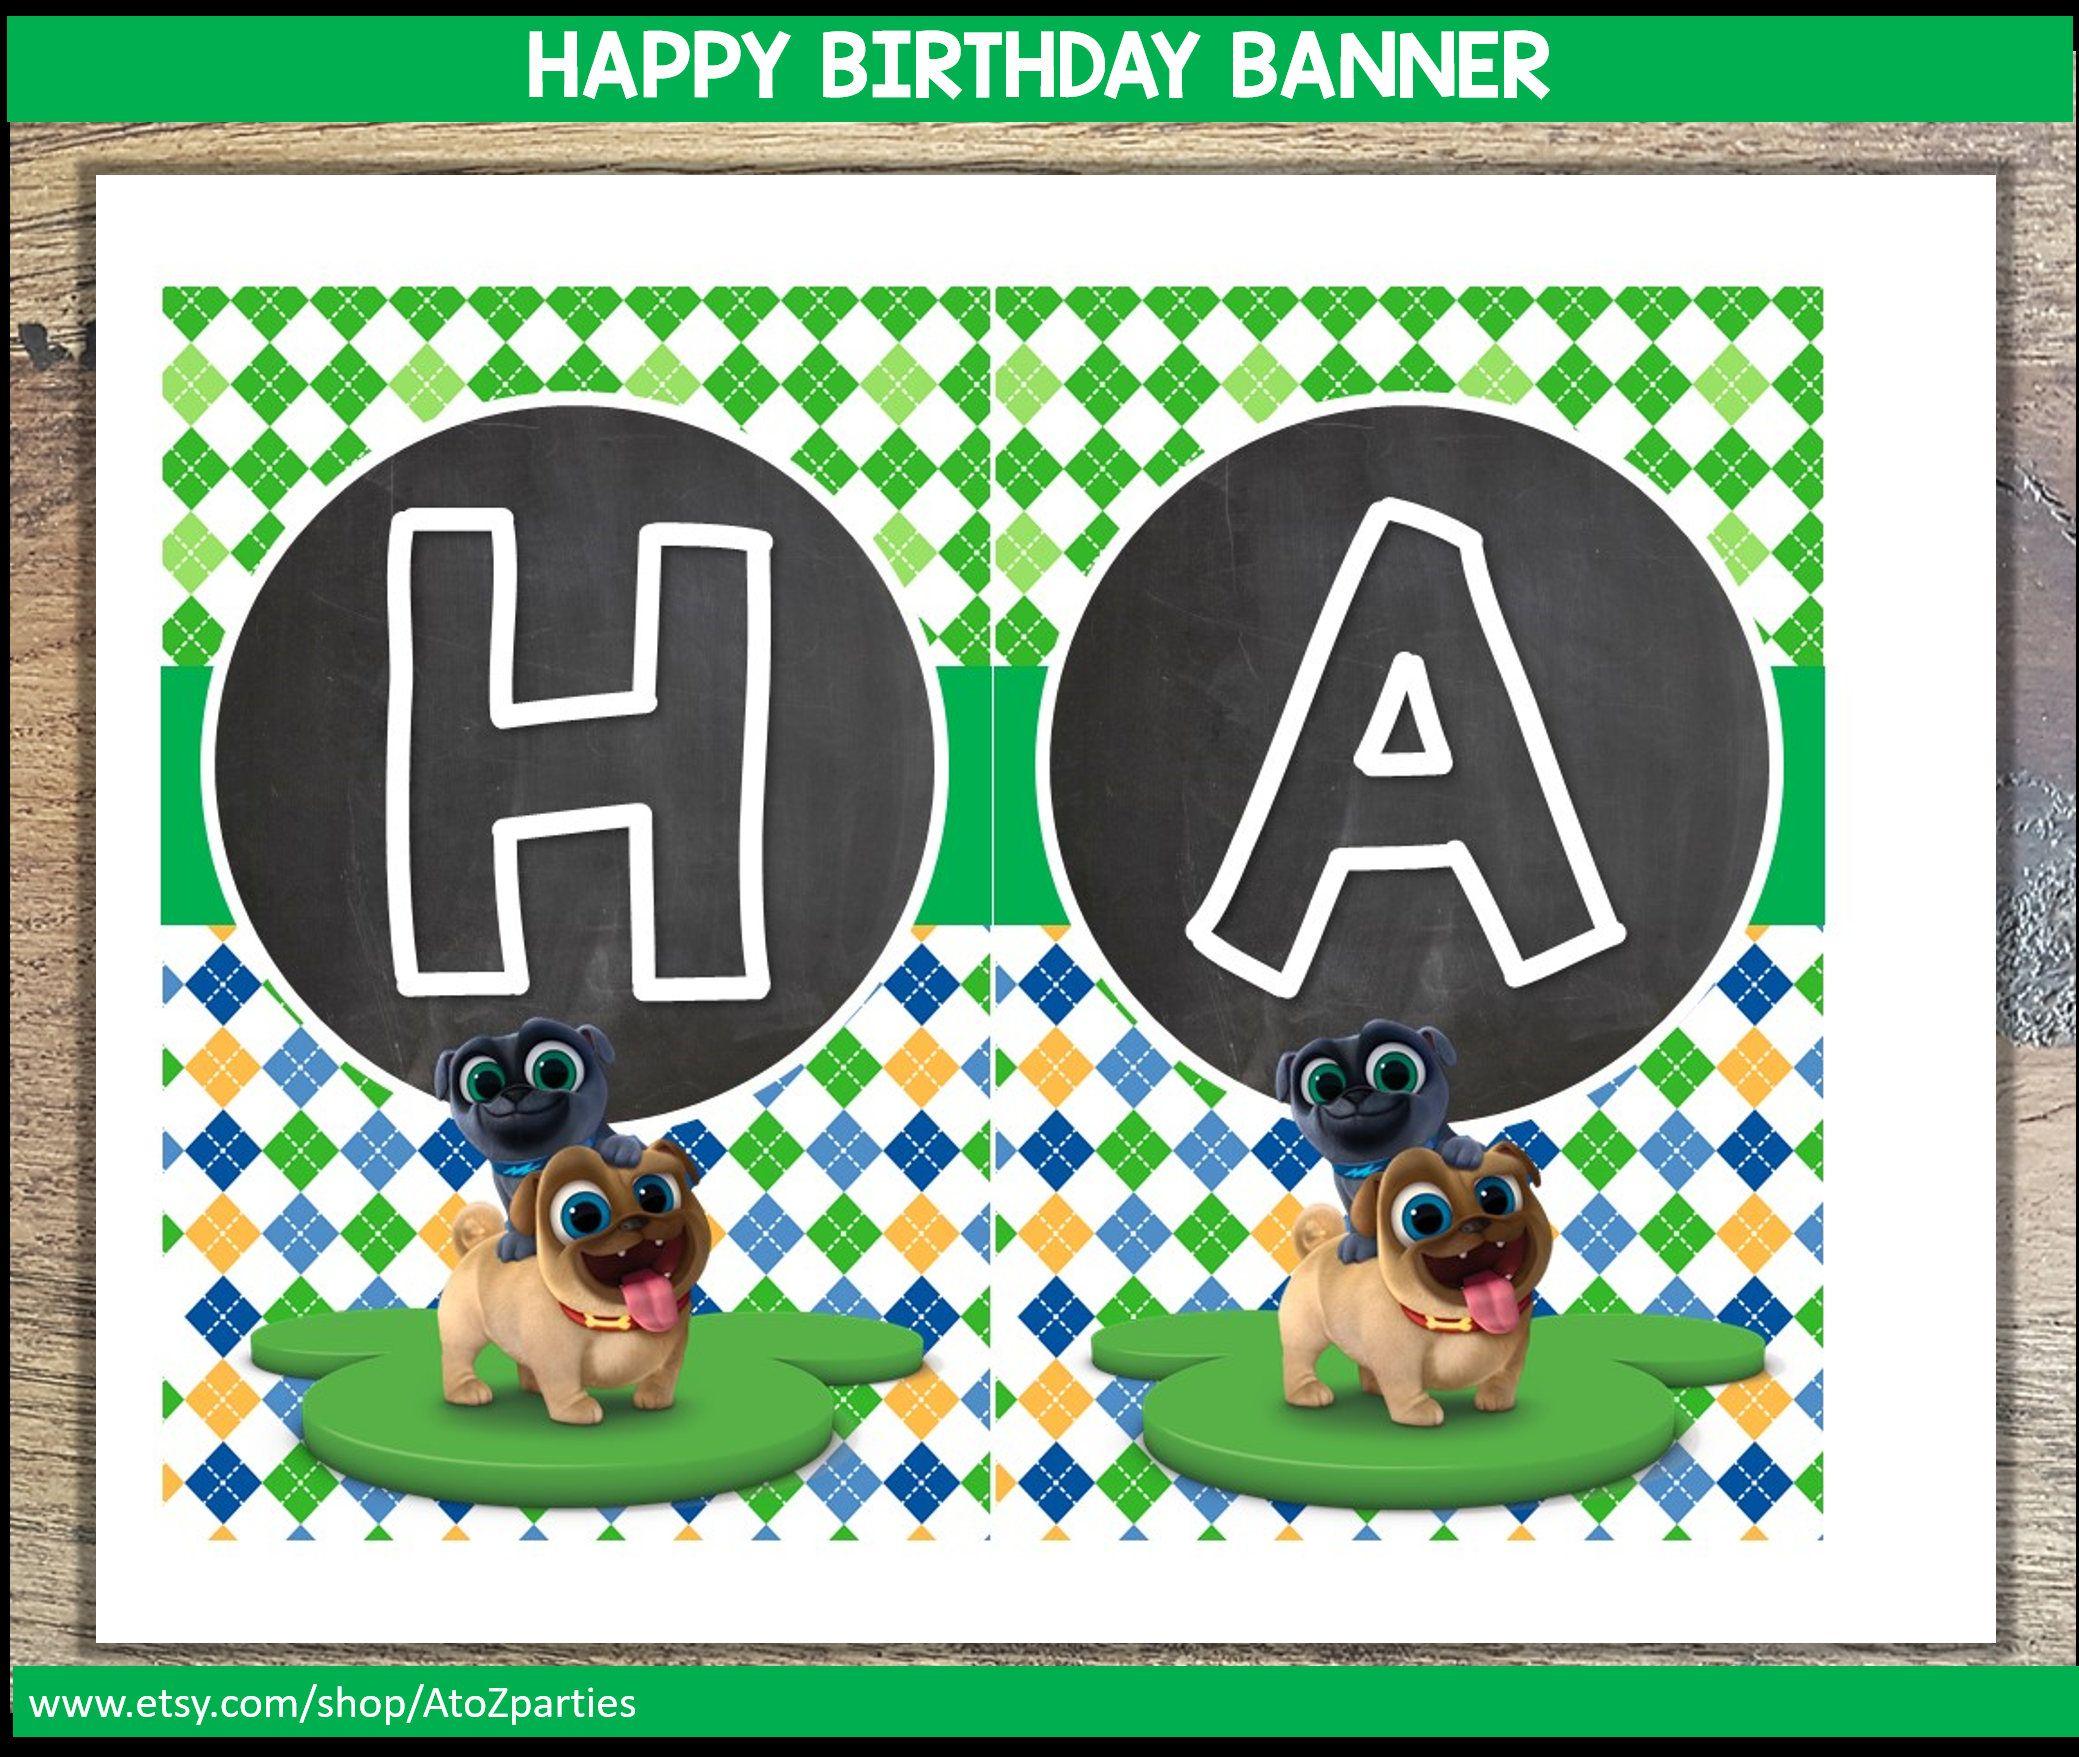 Puppy Dog Pals Happy Birthday Banner Green And Chalkboard Puppy